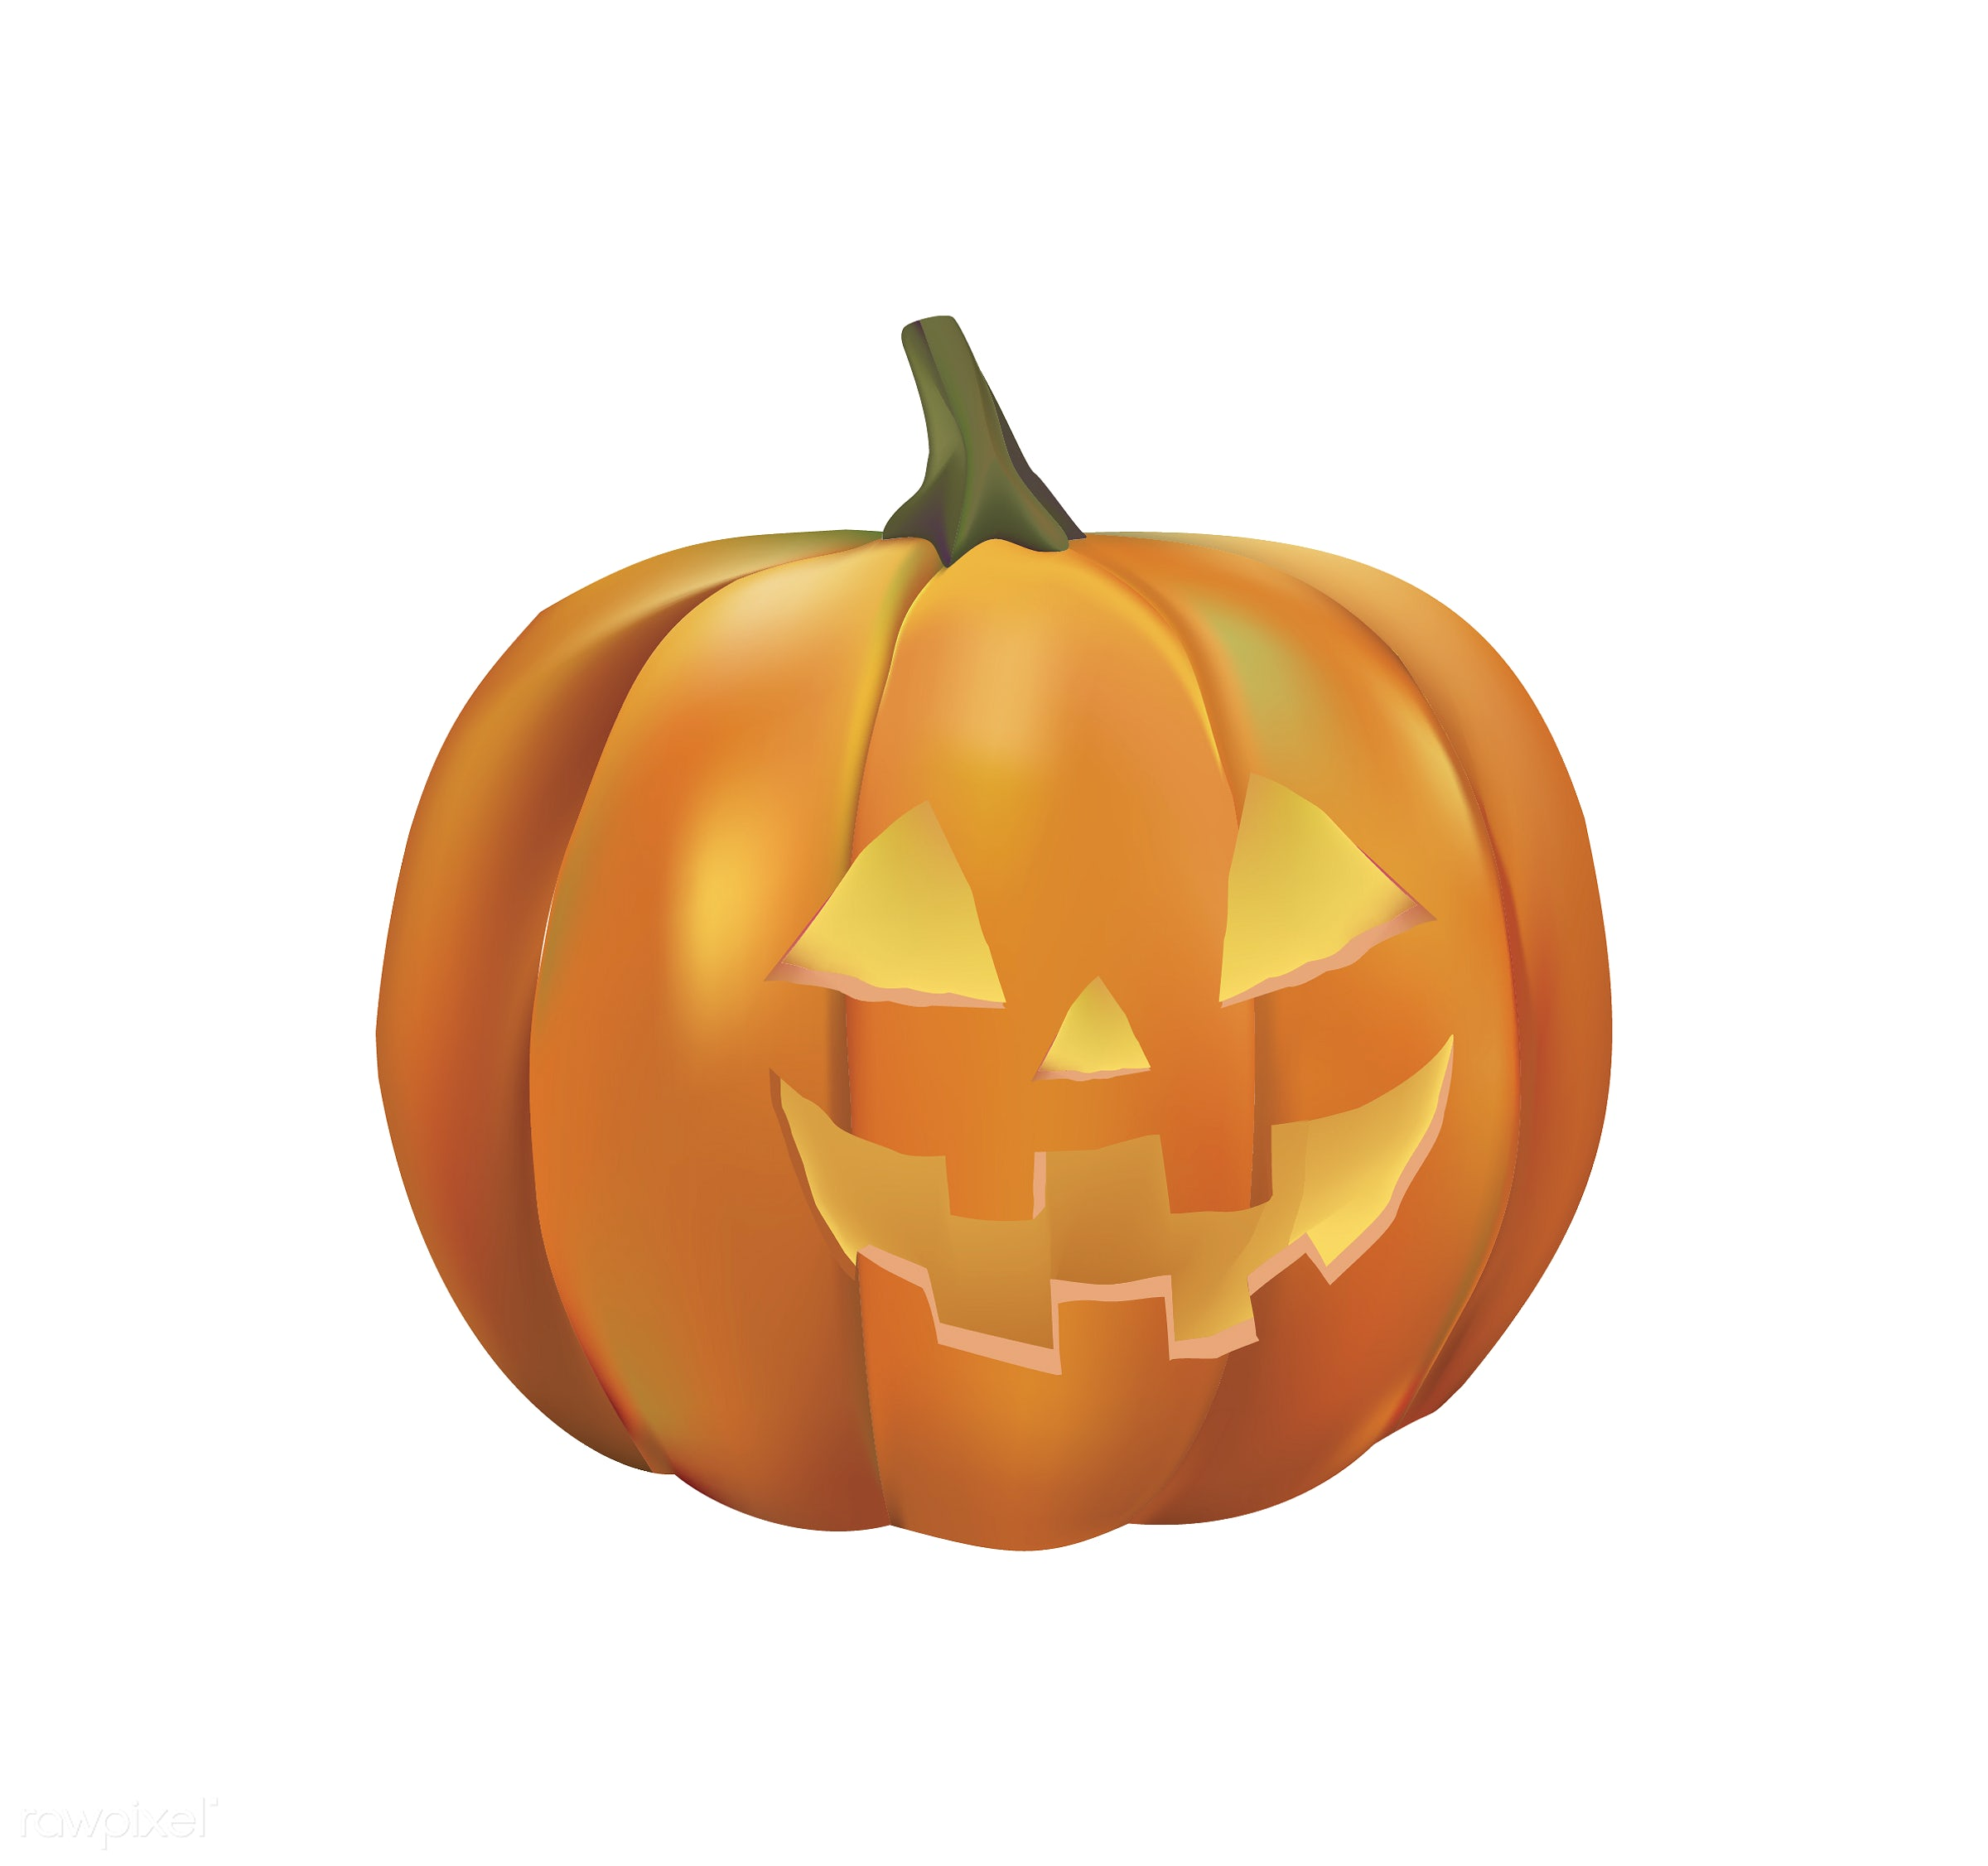 Halloween vector set - pumpkin, autumn, celebration, creepy, design, fall, festival, ghost, graphic, halloween, holiday,...